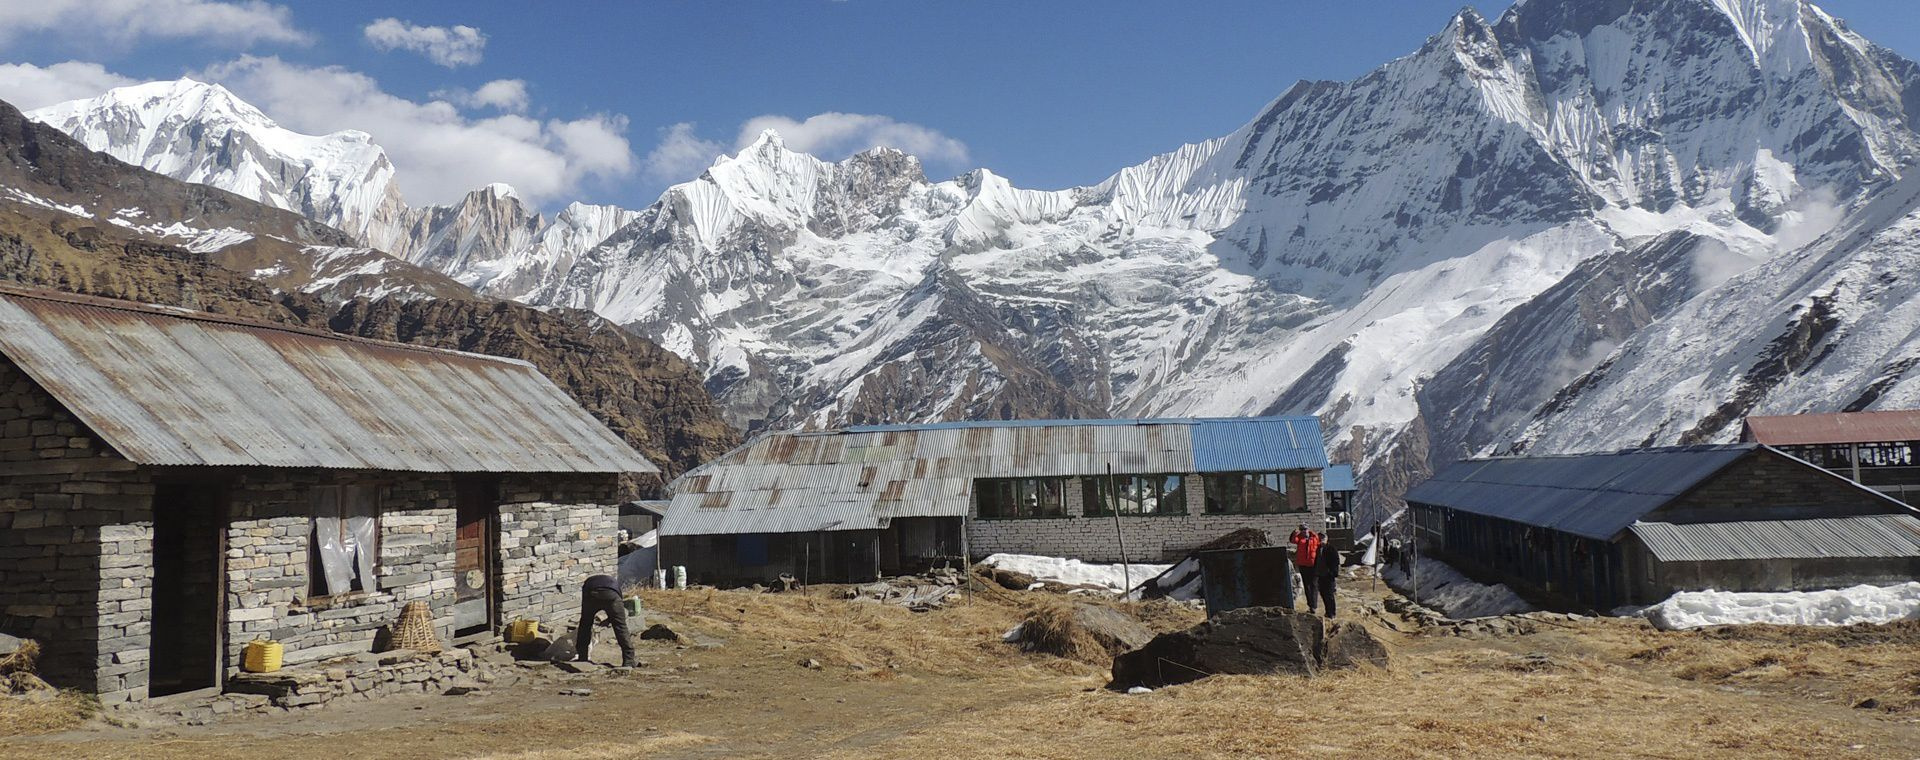 Voyage à pied : Grand tour des Annapurnas